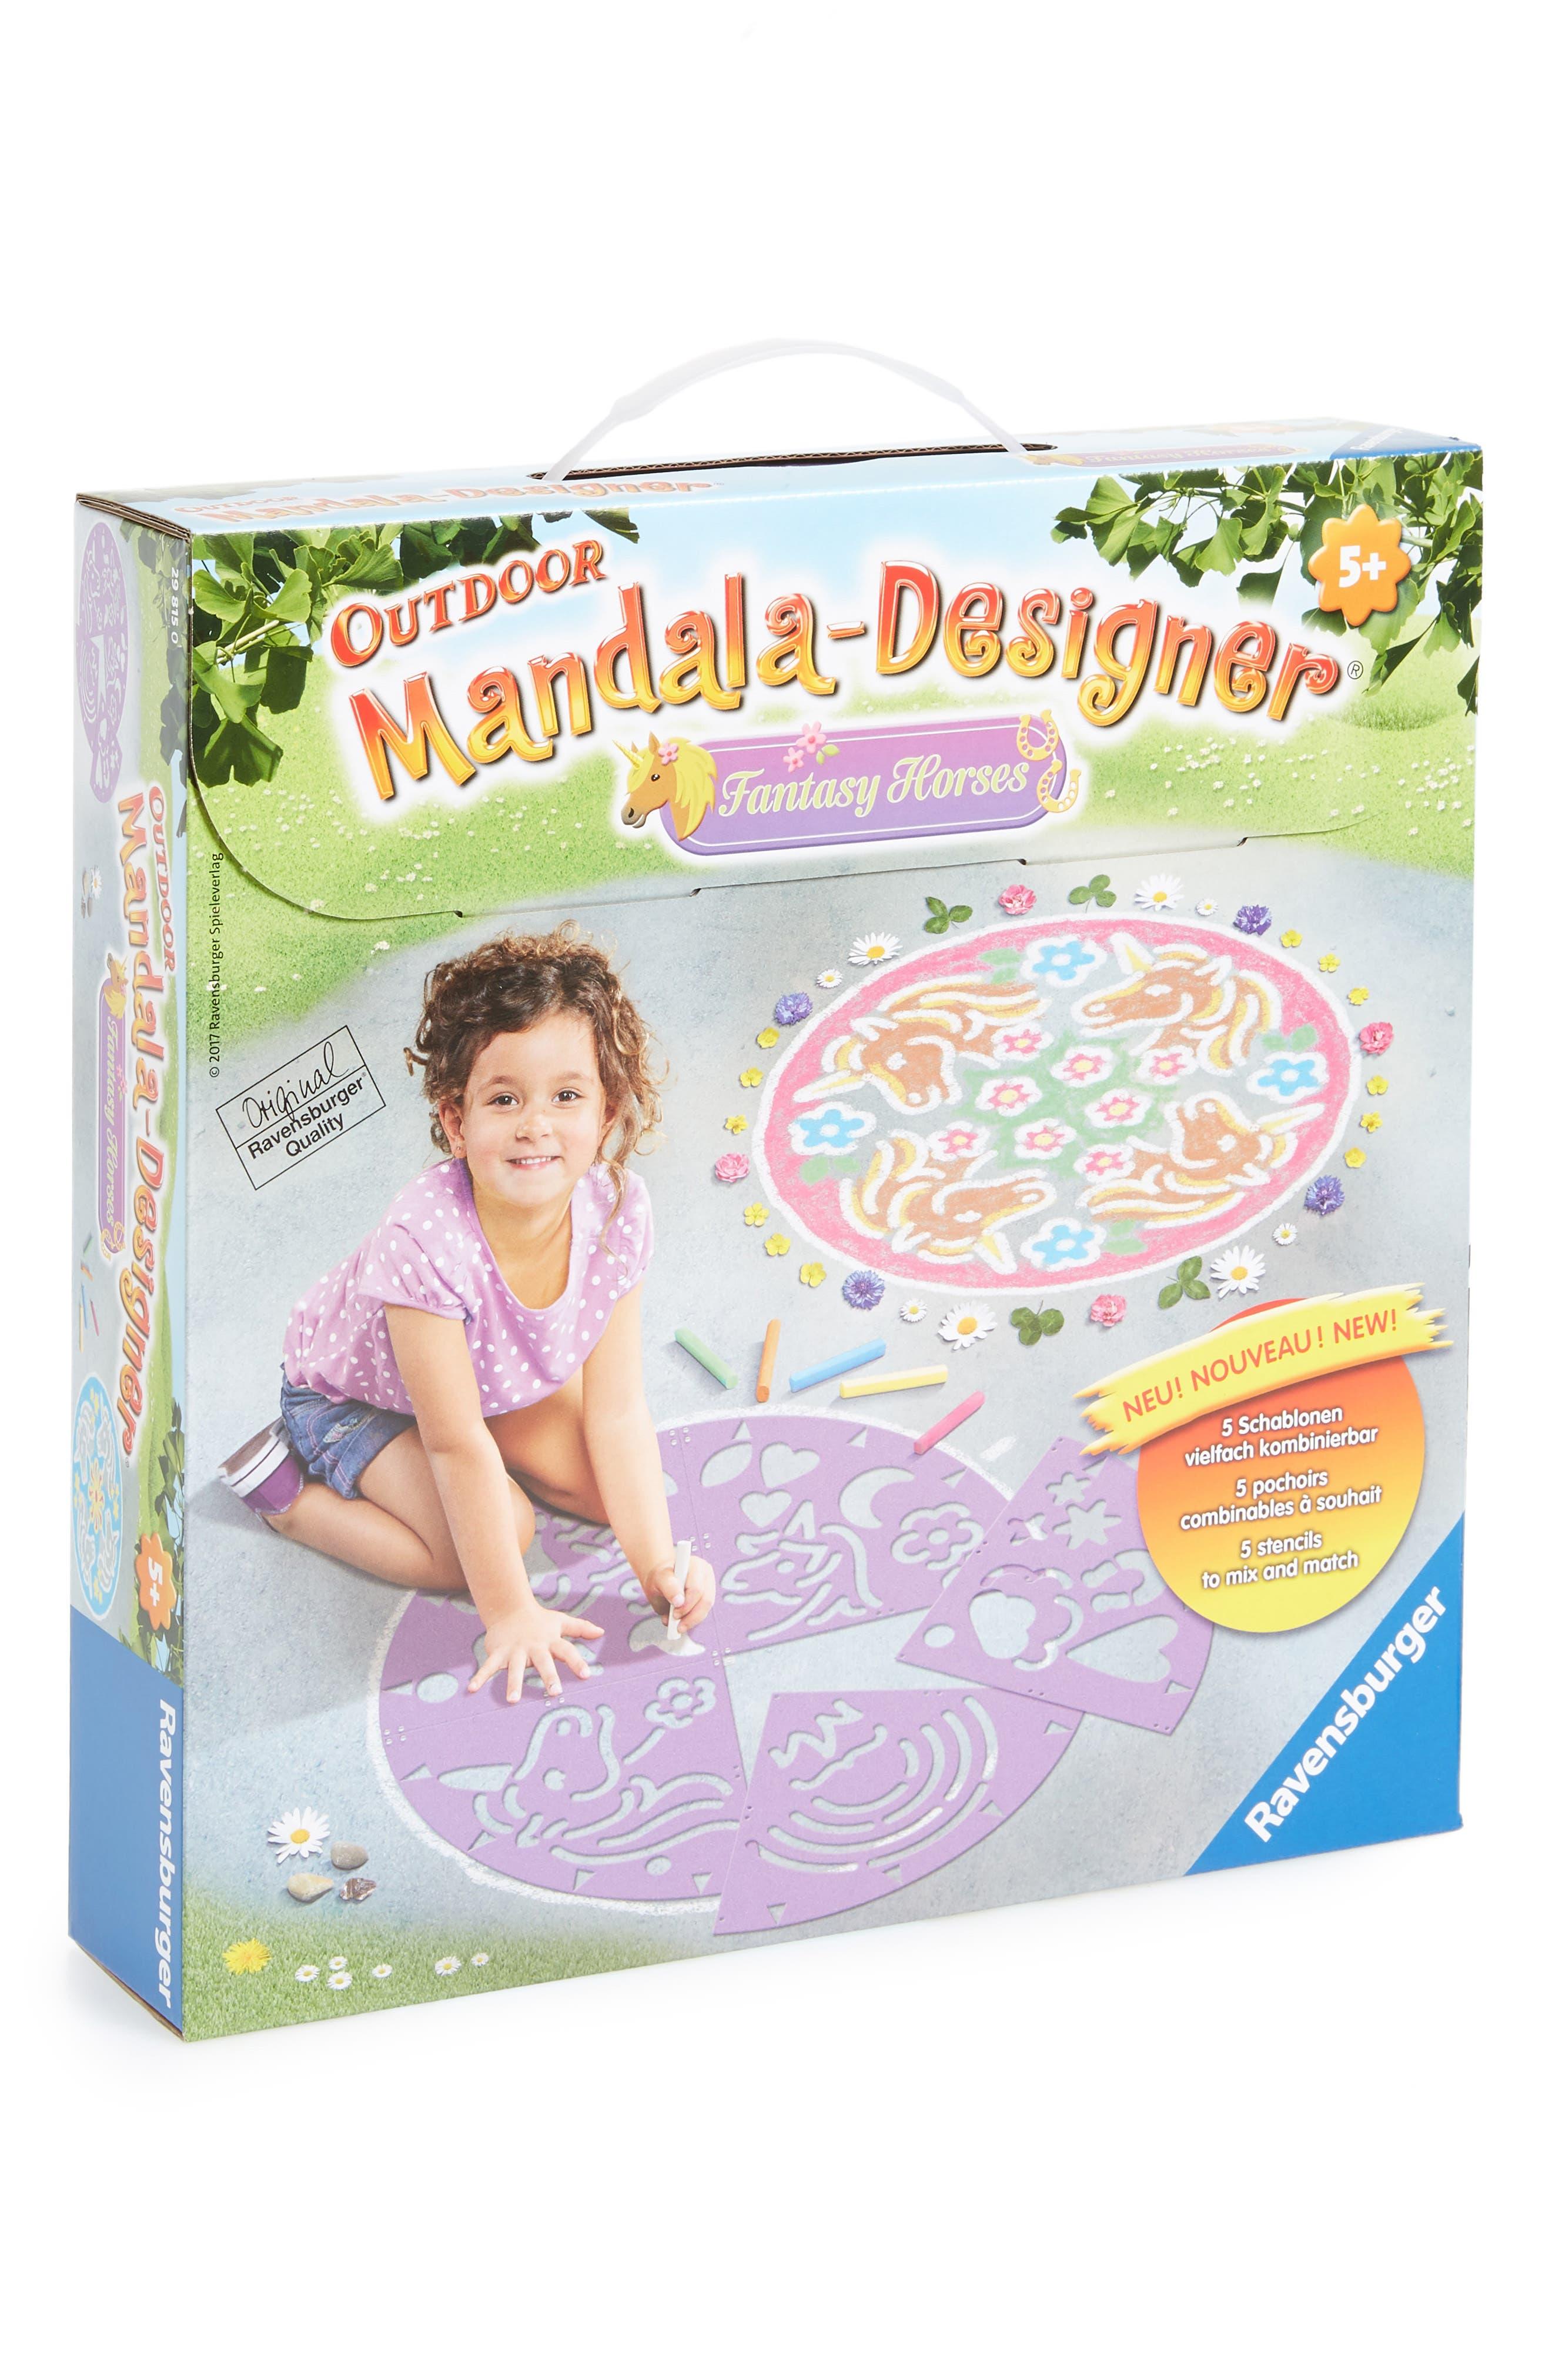 Outdoor Mandala Designer Fantasy Horses Chalk Kit,                         Main,                         color, PURPLE